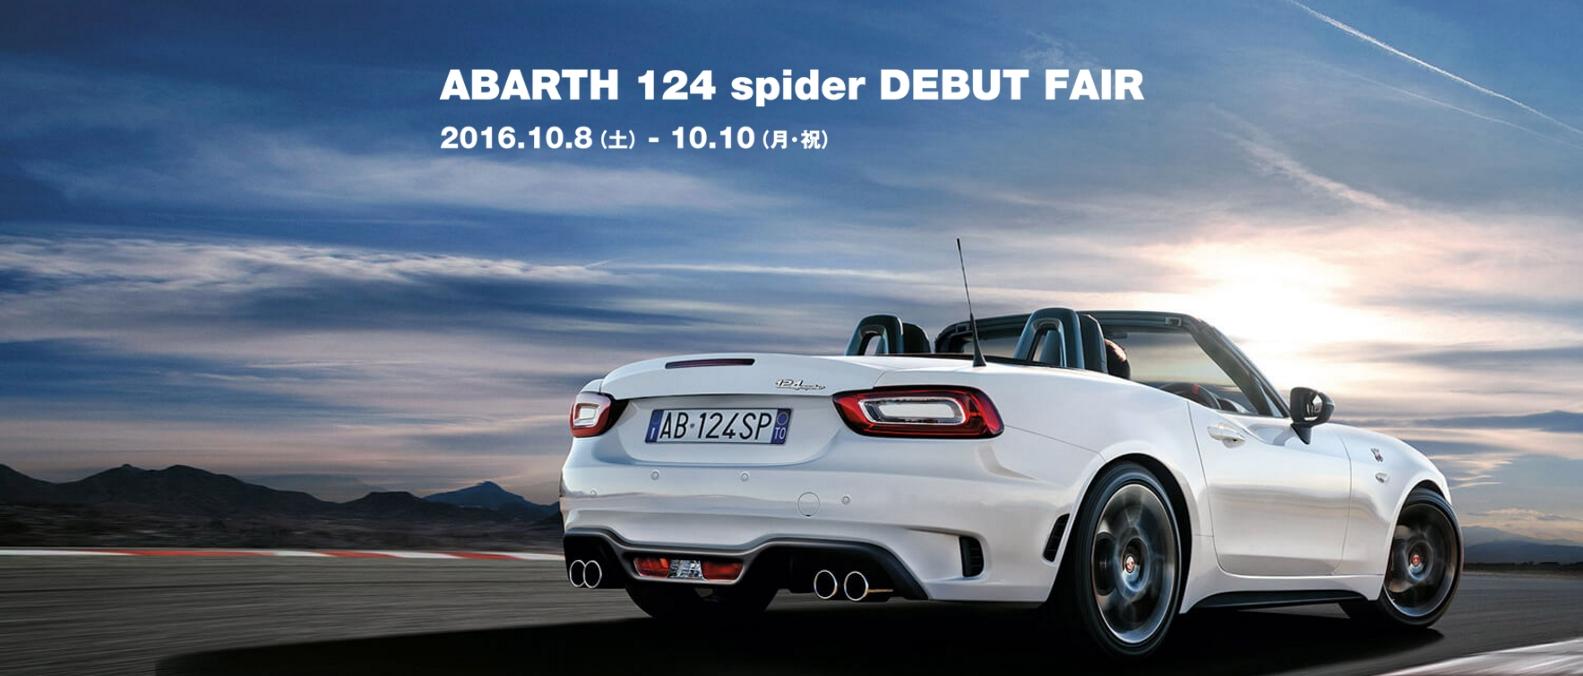 161001abarth124spider_debut_fair